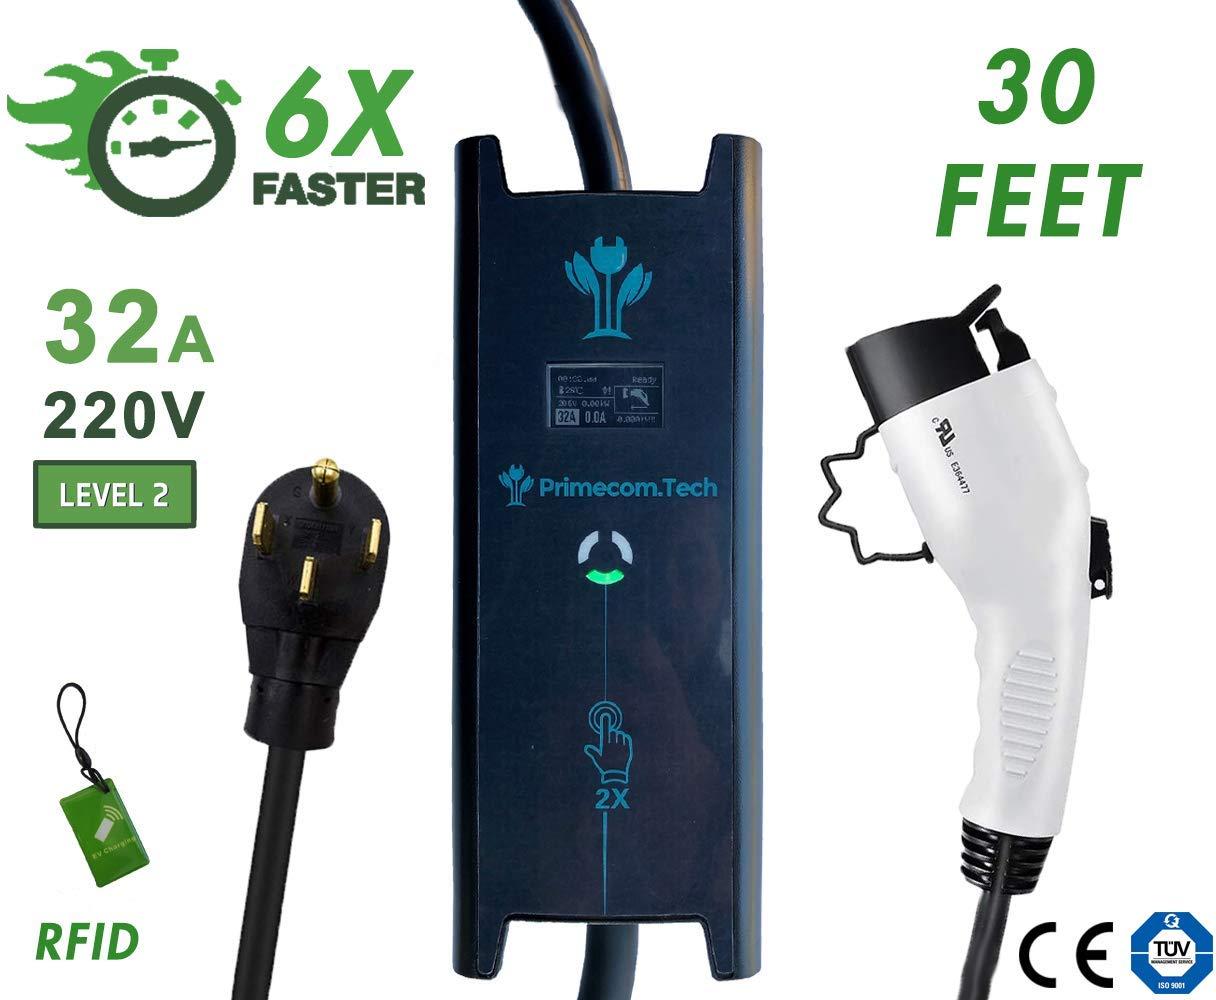 Amazon.com: Primecom - Cargador eléctrico para vehículos de ...